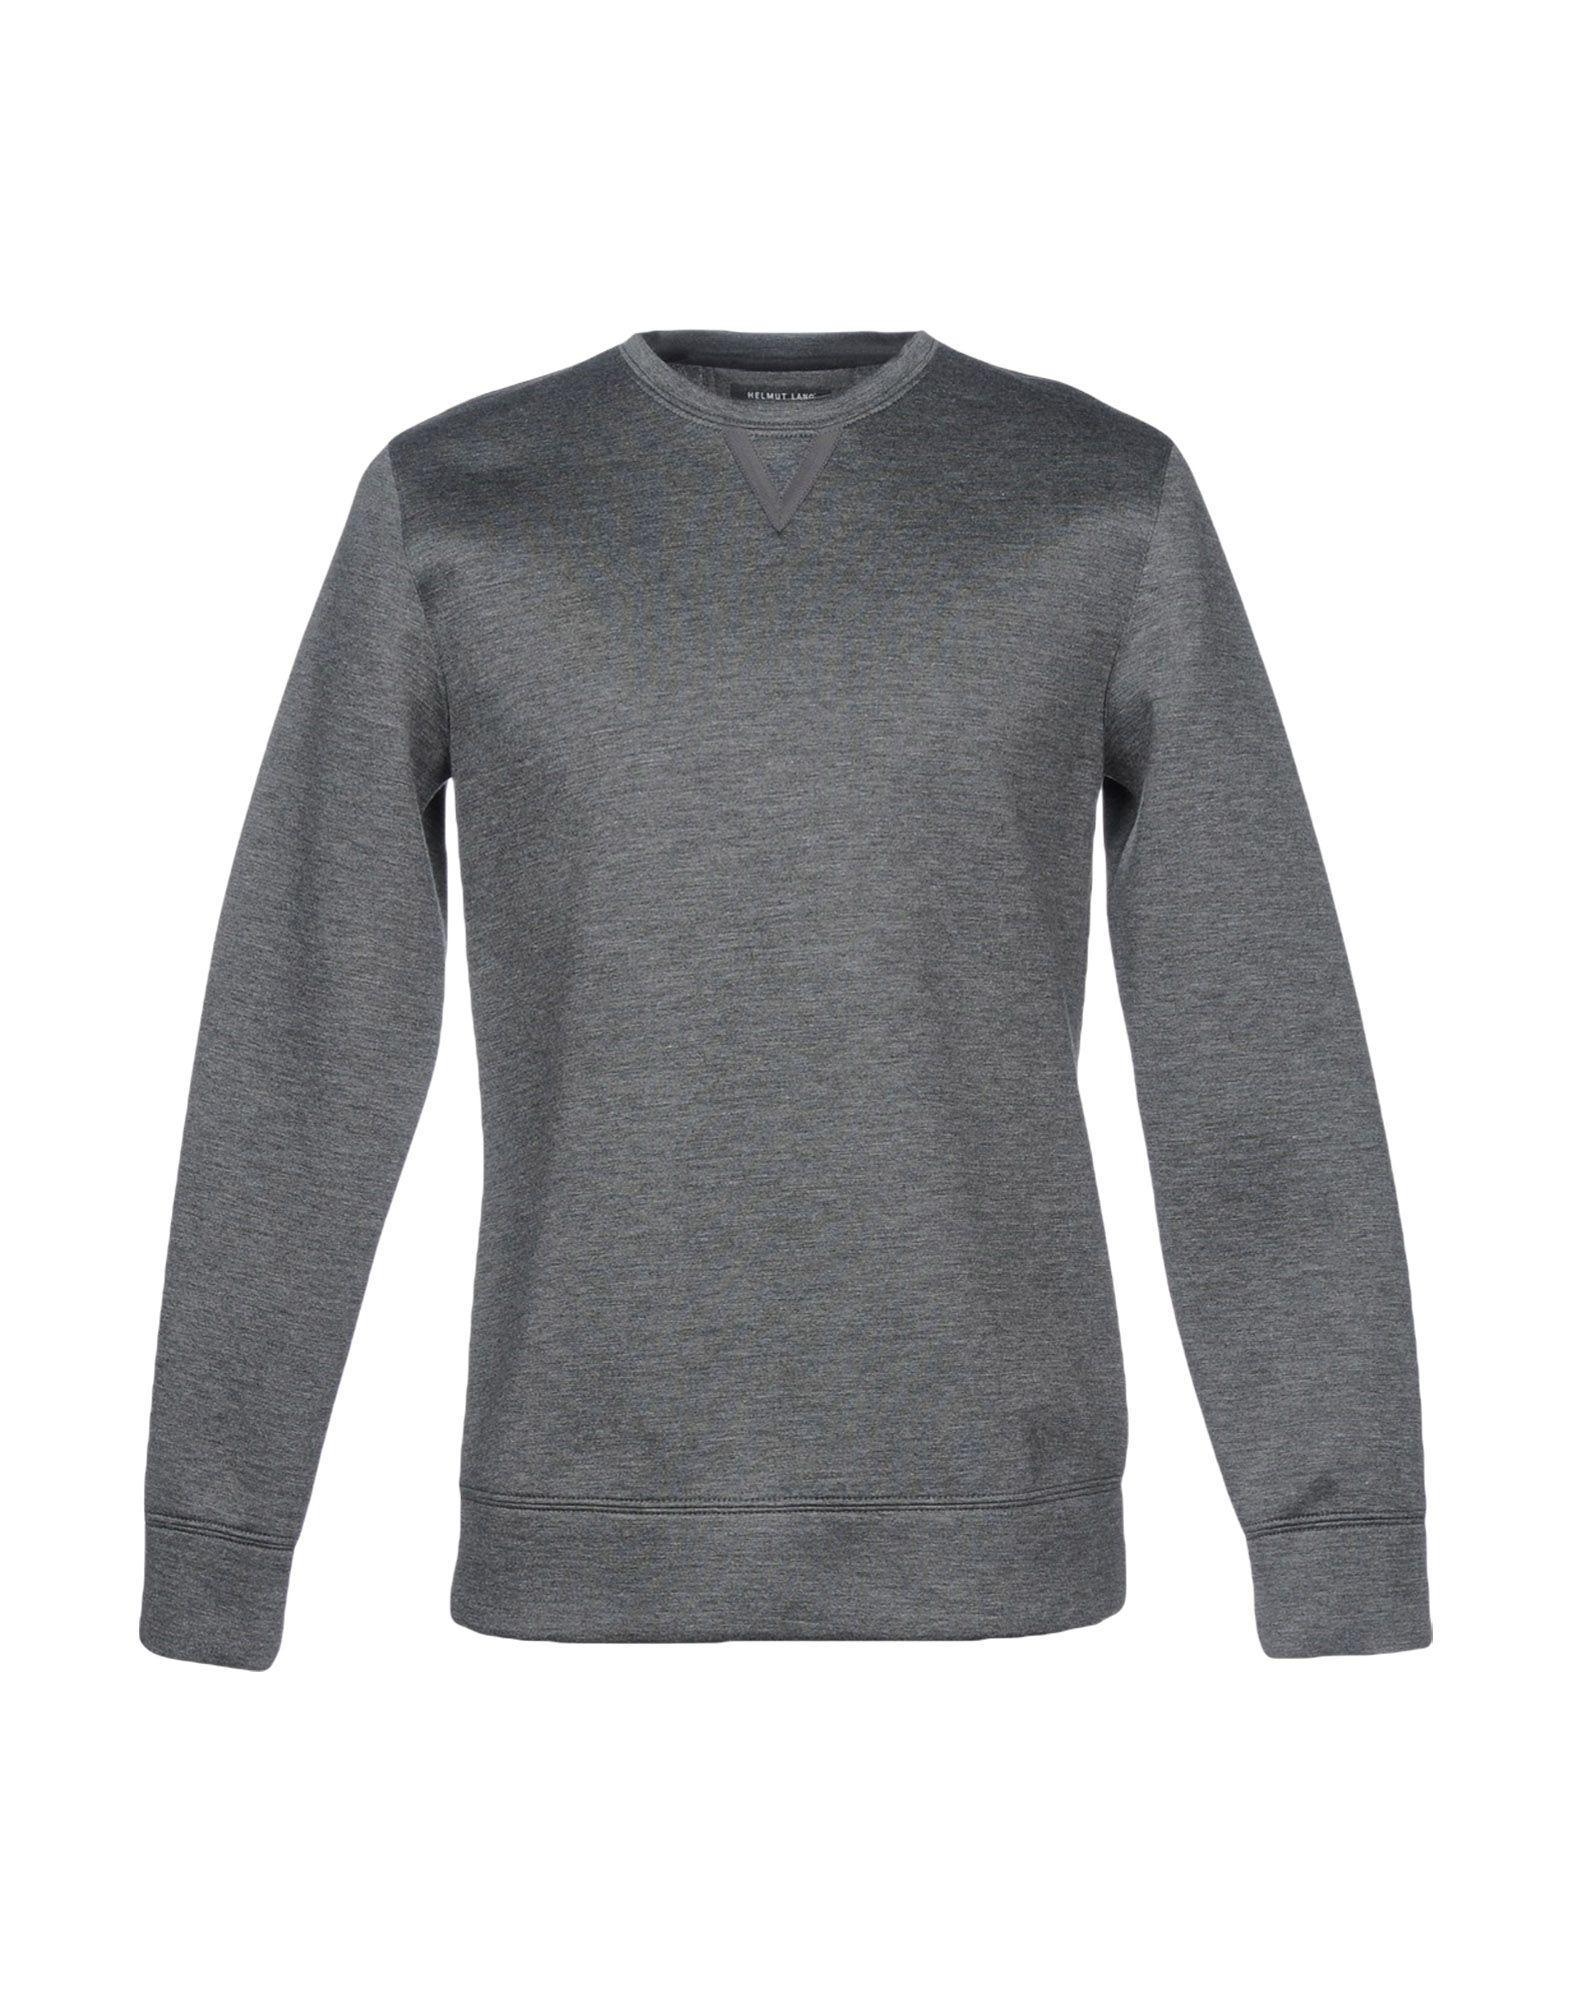 Helmut Lang Sweatshirt In Lead